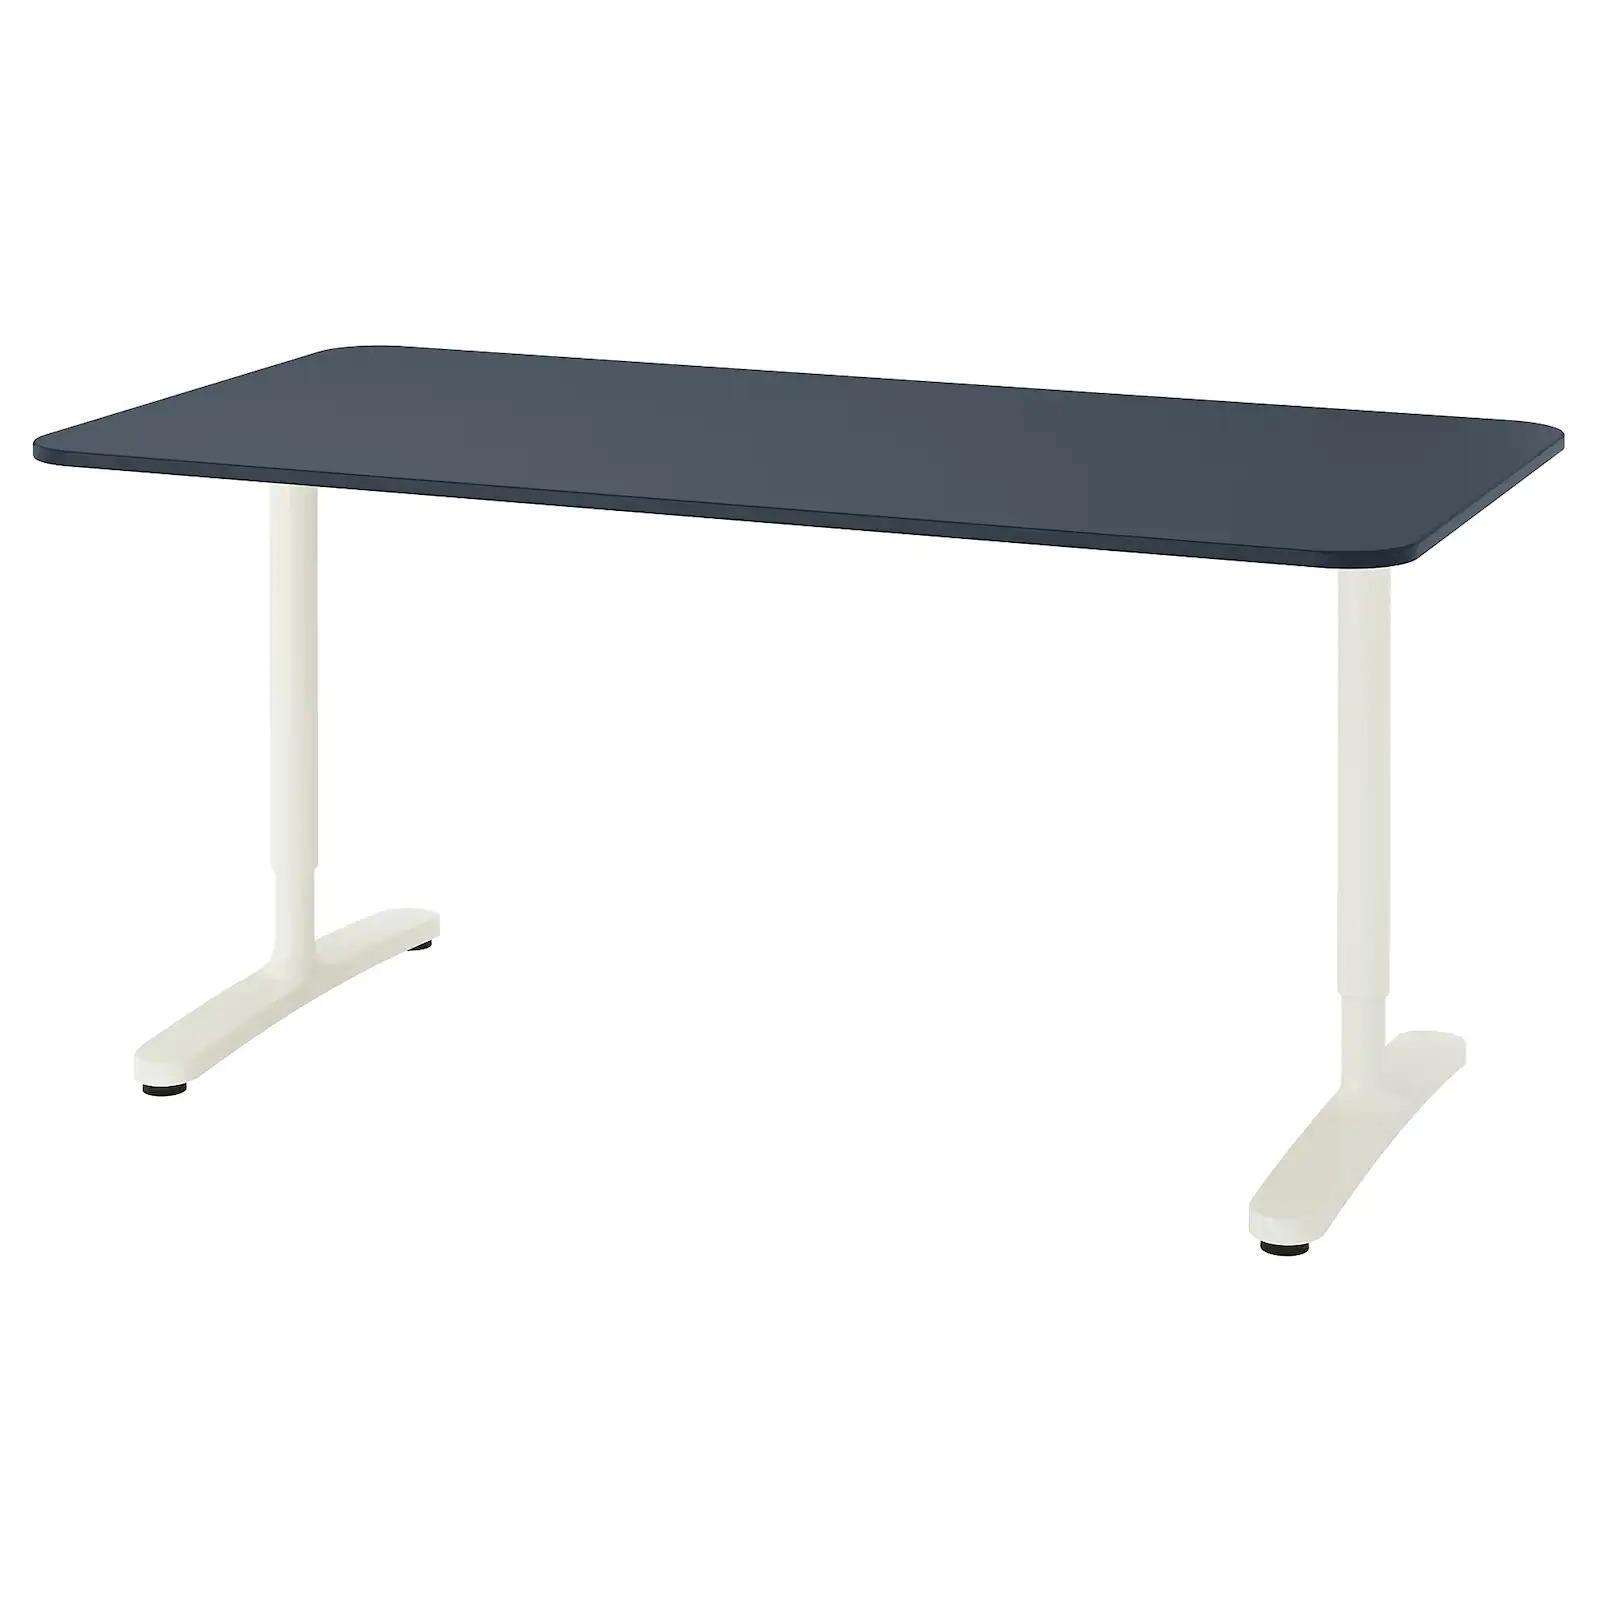 [withIKEA]이케아 책상 BEKANT 베칸트 160x80cm 리놀륨블루+화이트, 이케아 홈퍼니싱 핸드북 파일 제공